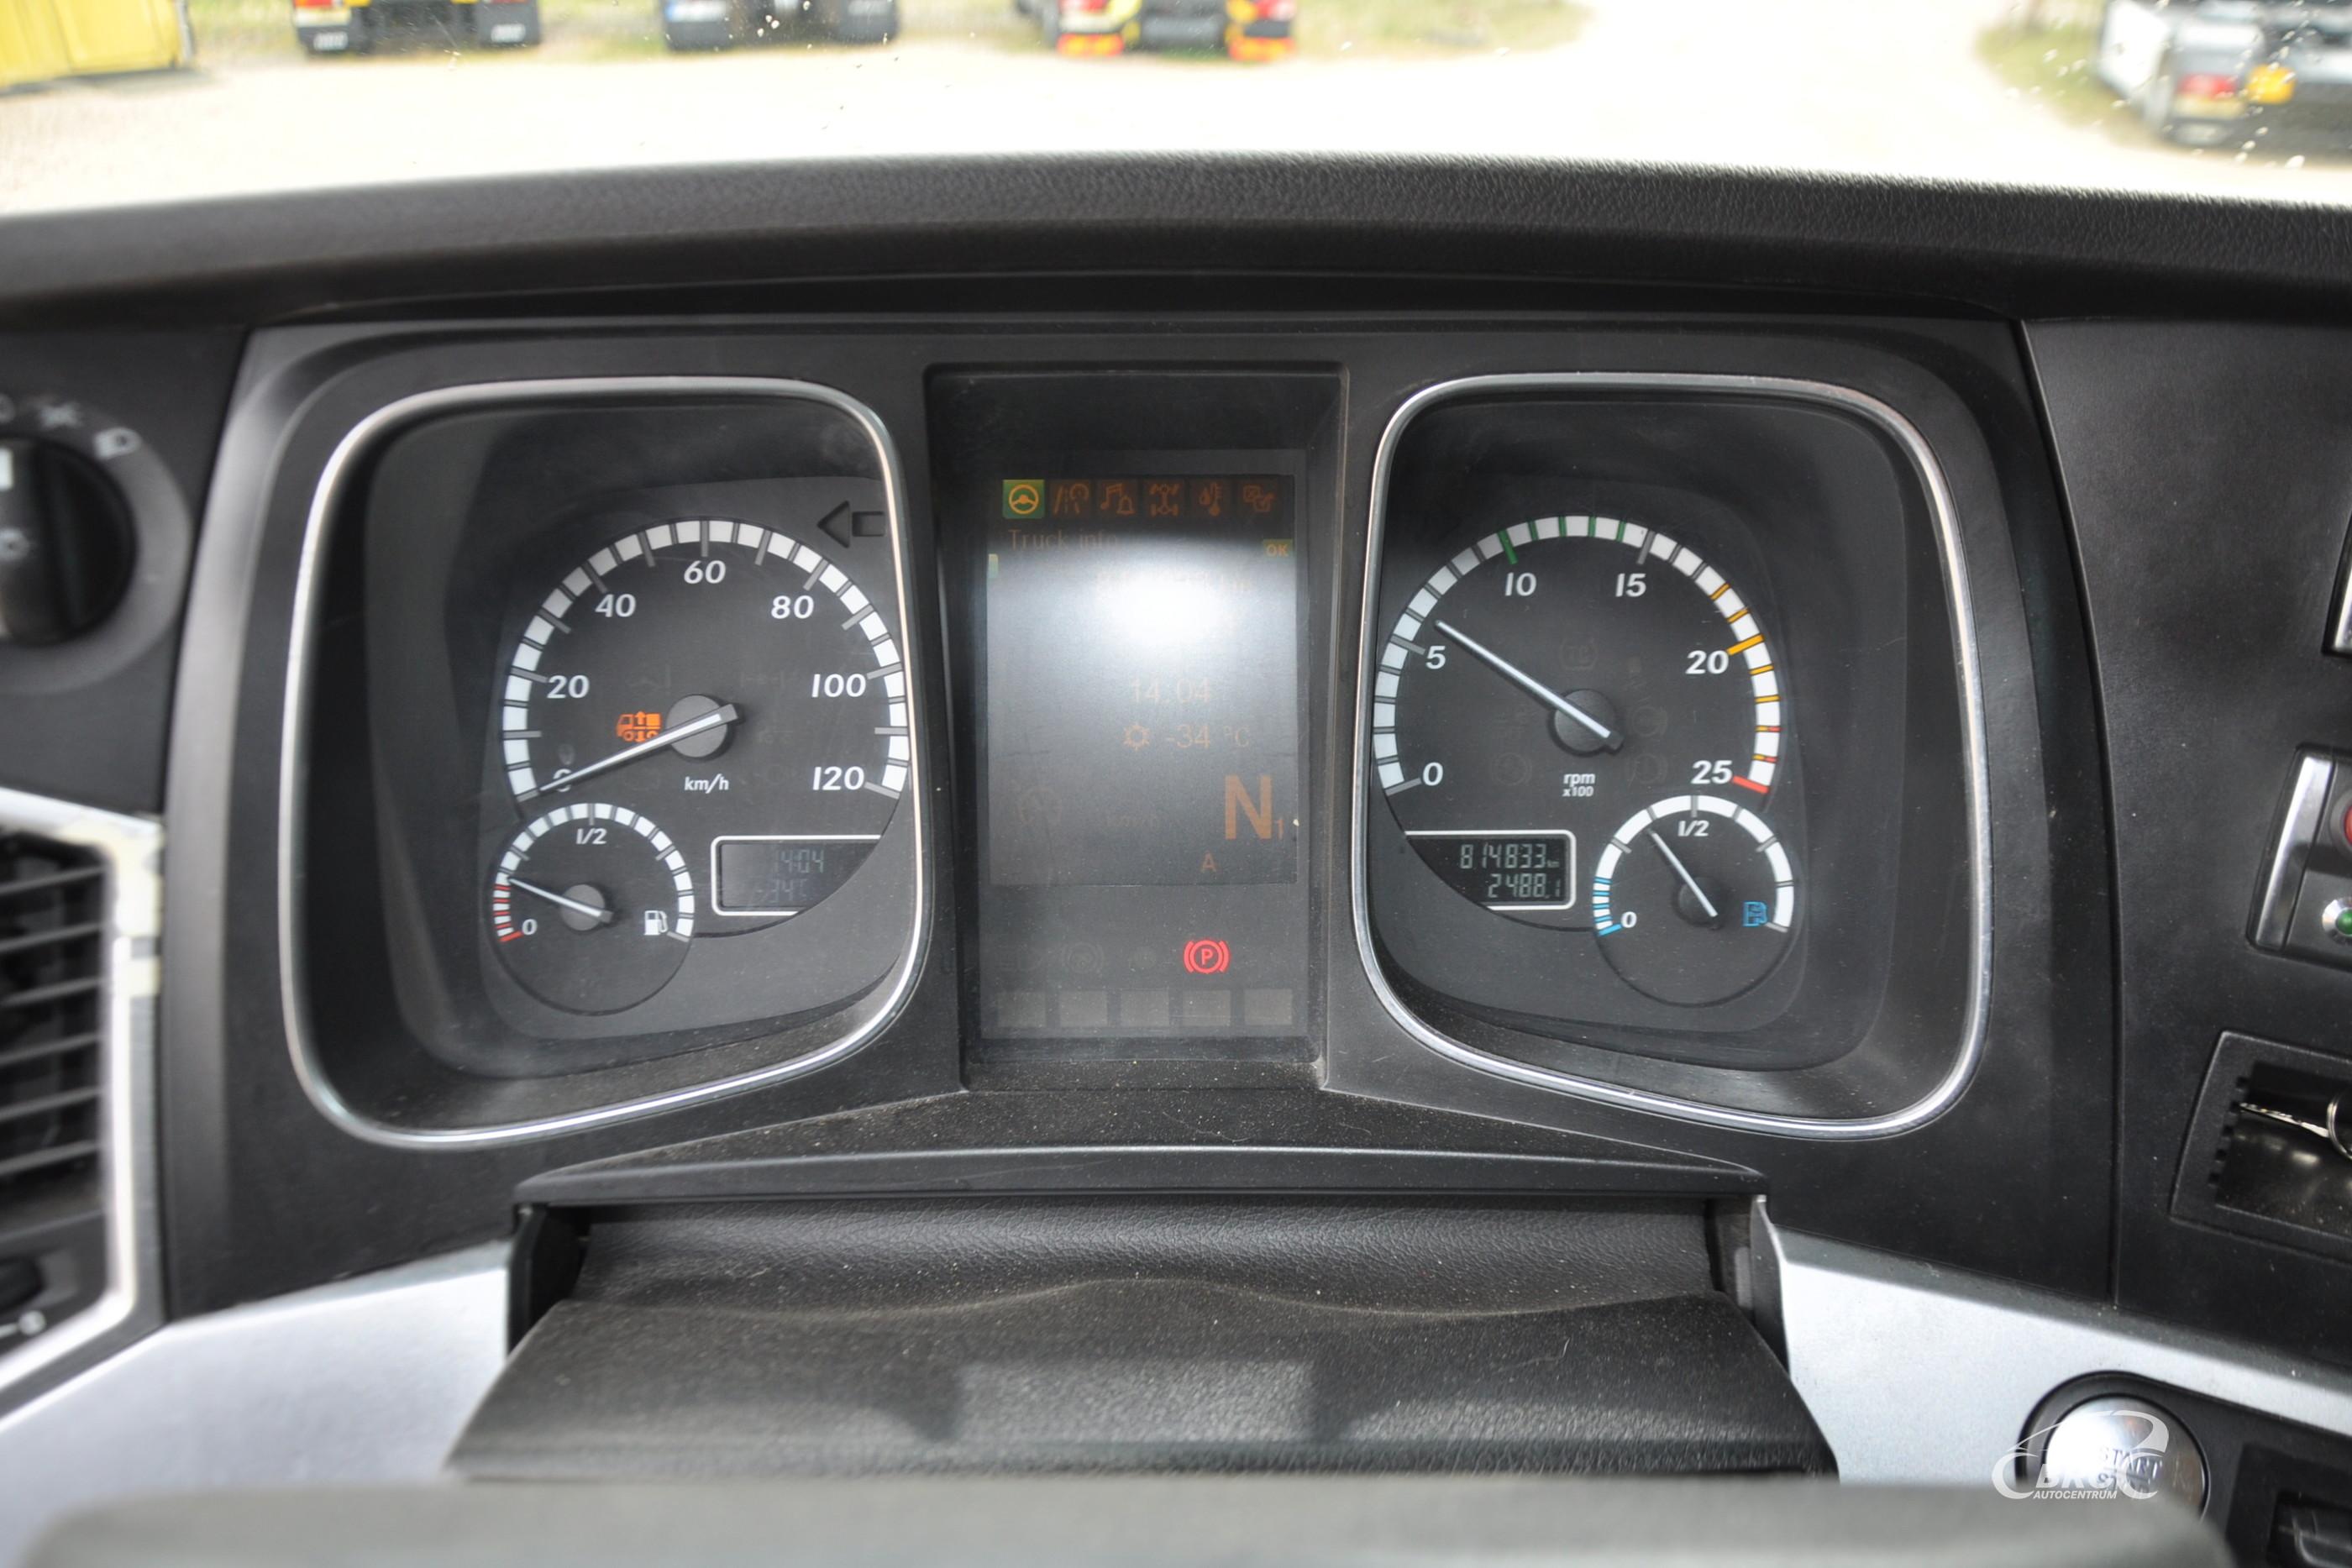 Mercedes-Benz Actros 2551 crane Ferrari F726